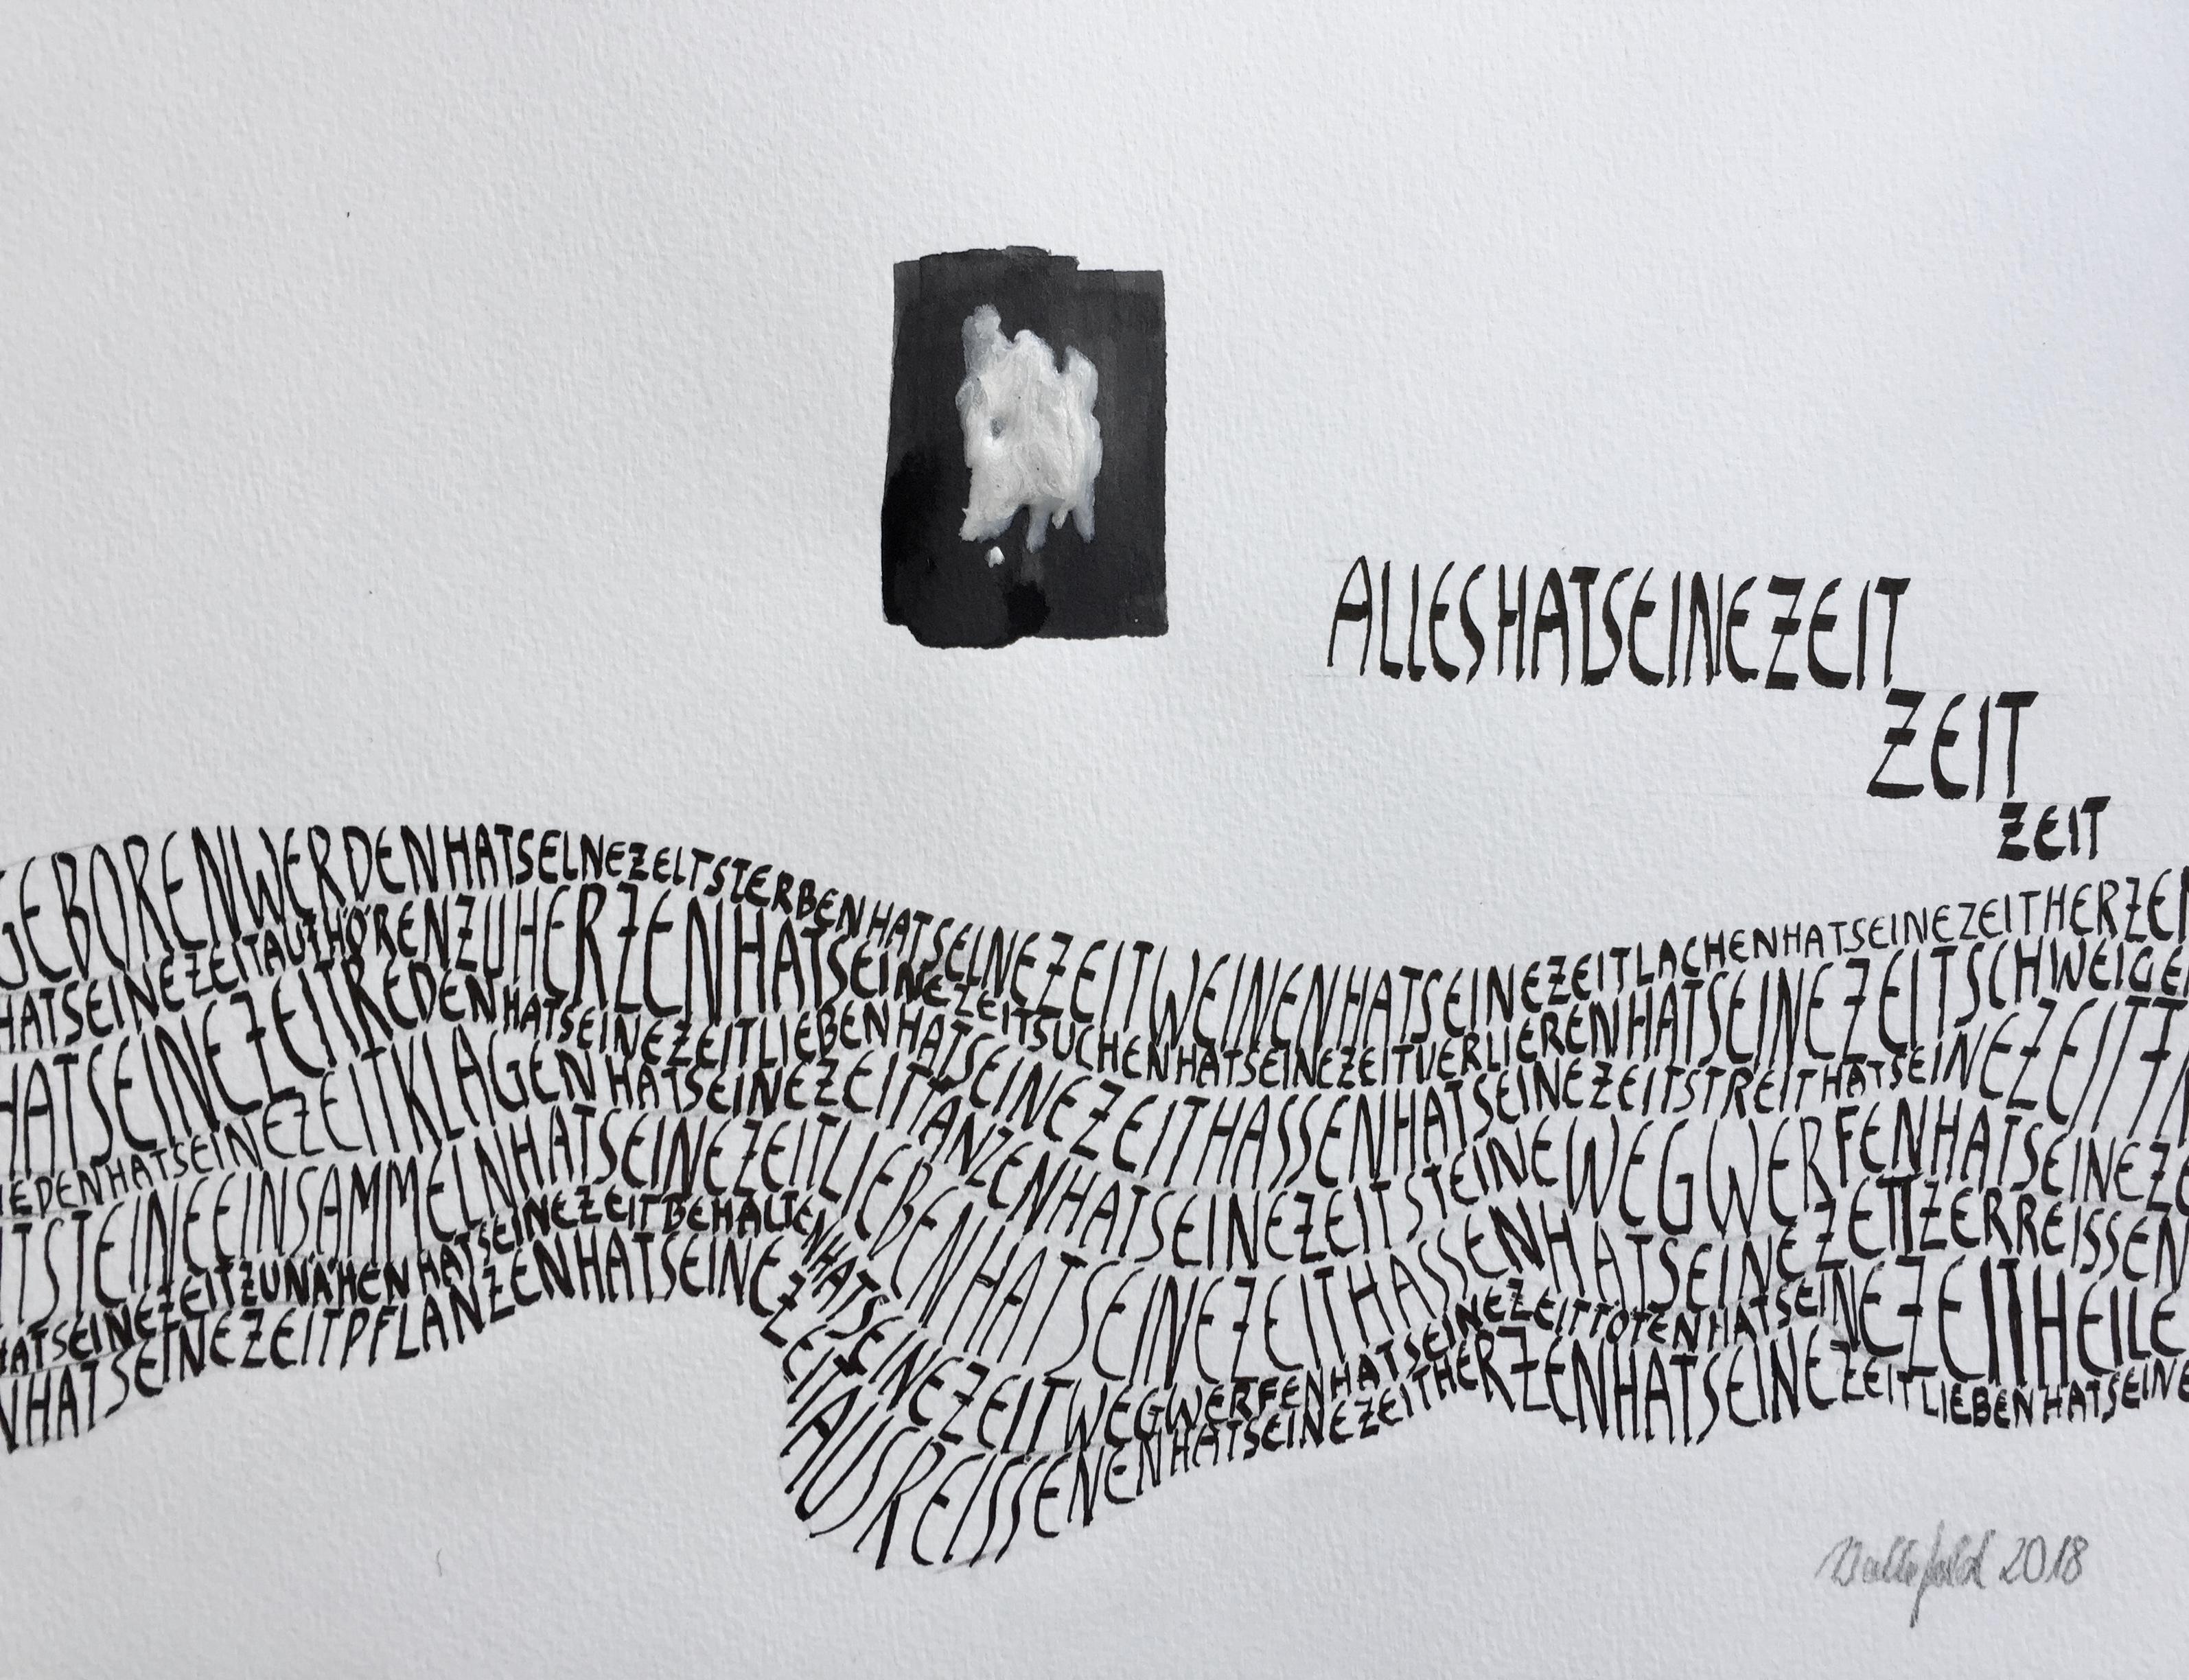 fullsizeoutput_417b